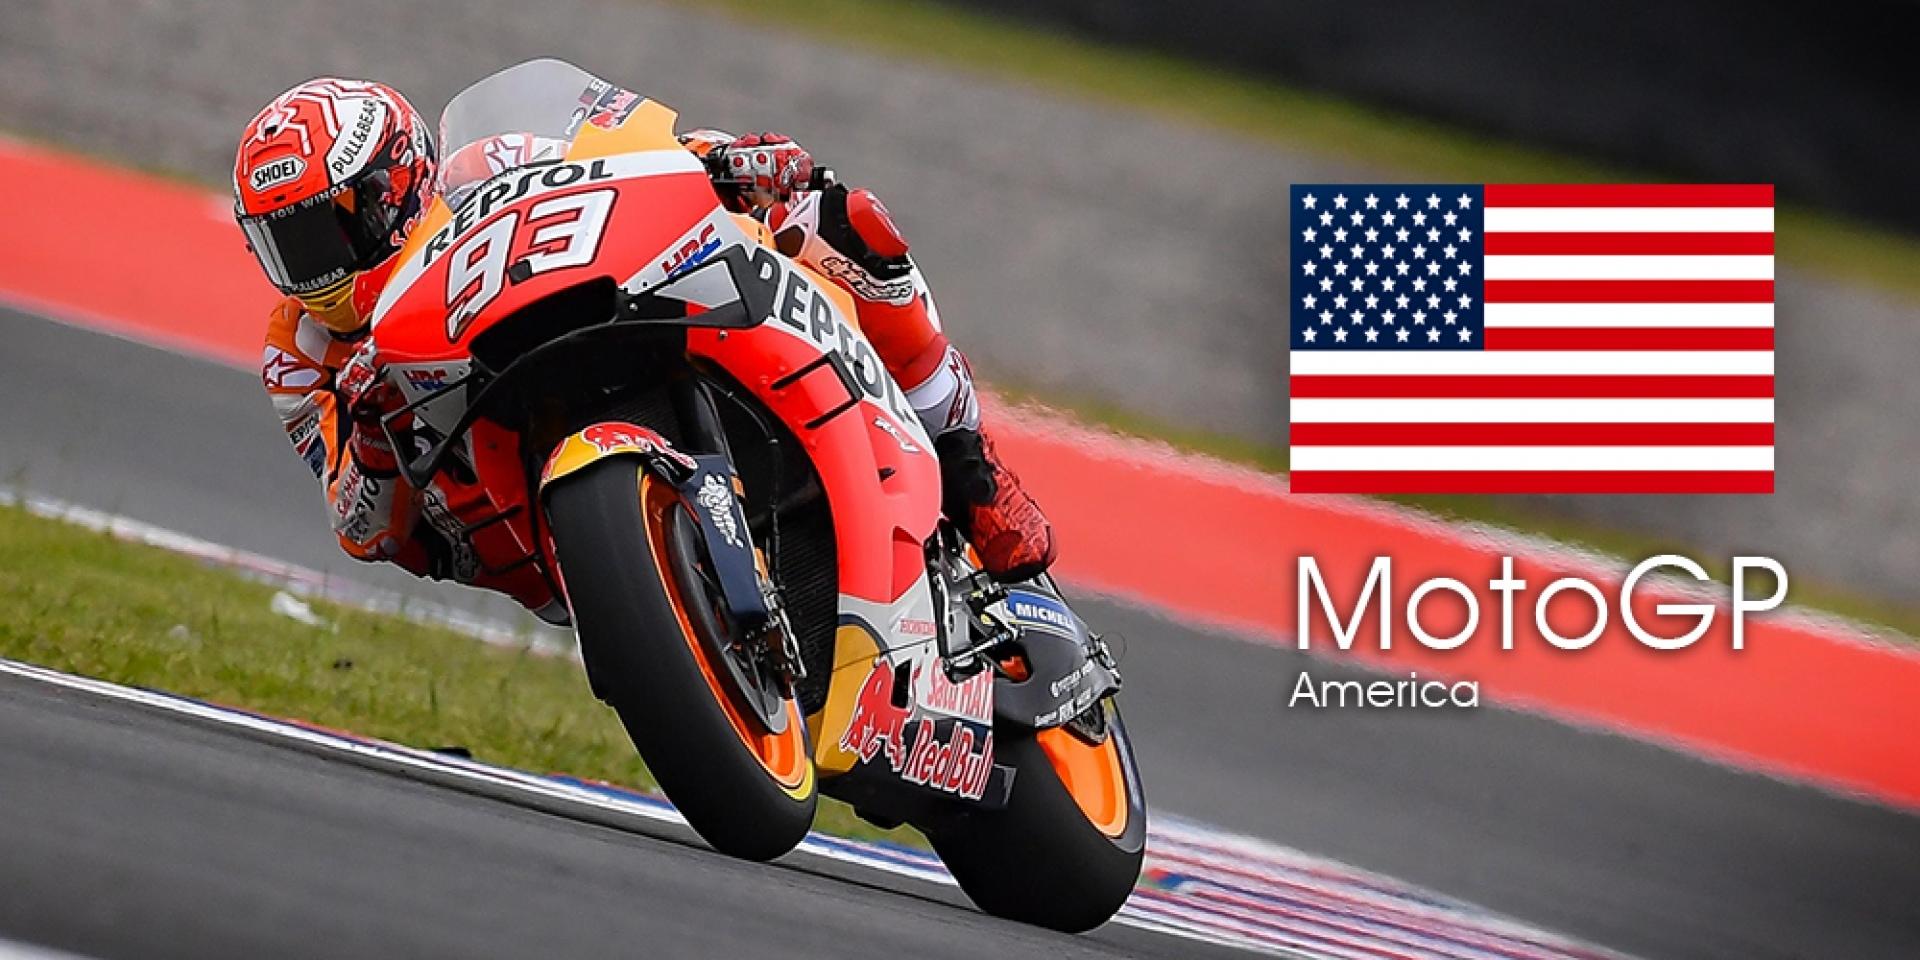 MotoGP 2019 美國站 轉播時間   SUPERMOTO8